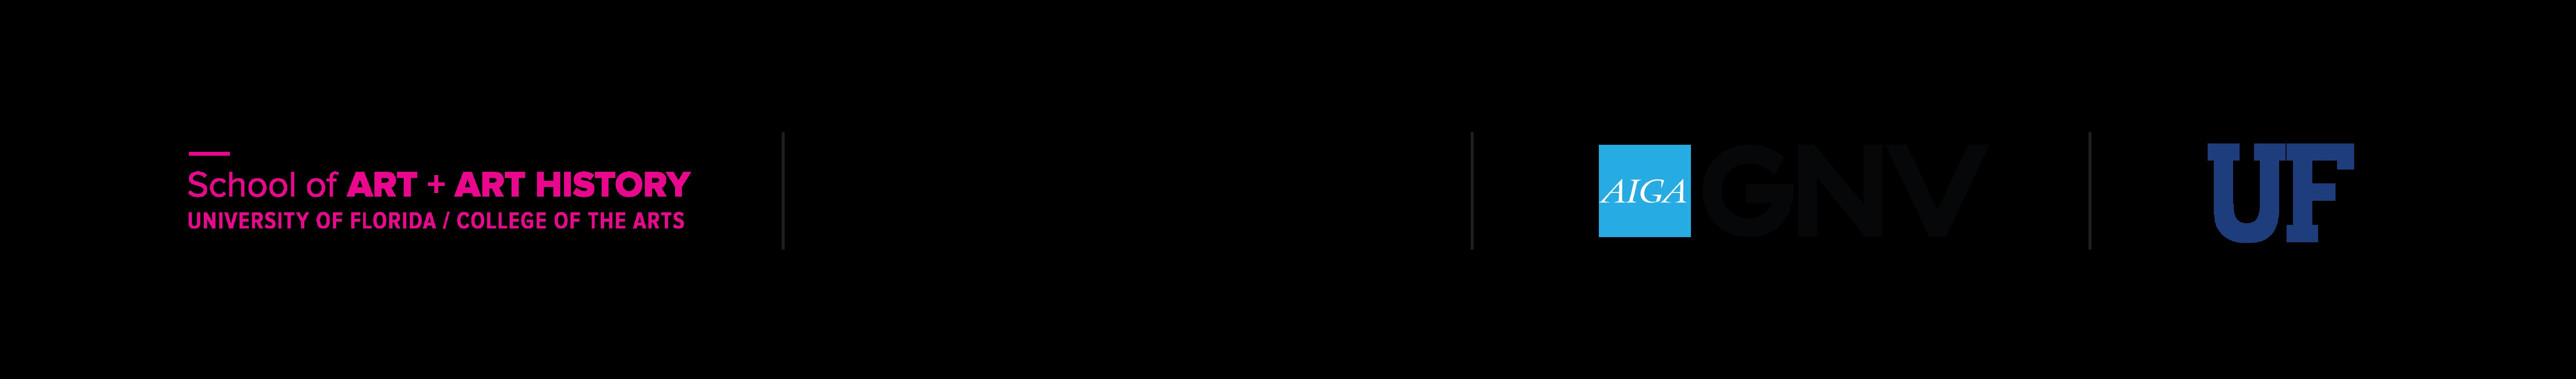 ligature_logos-02